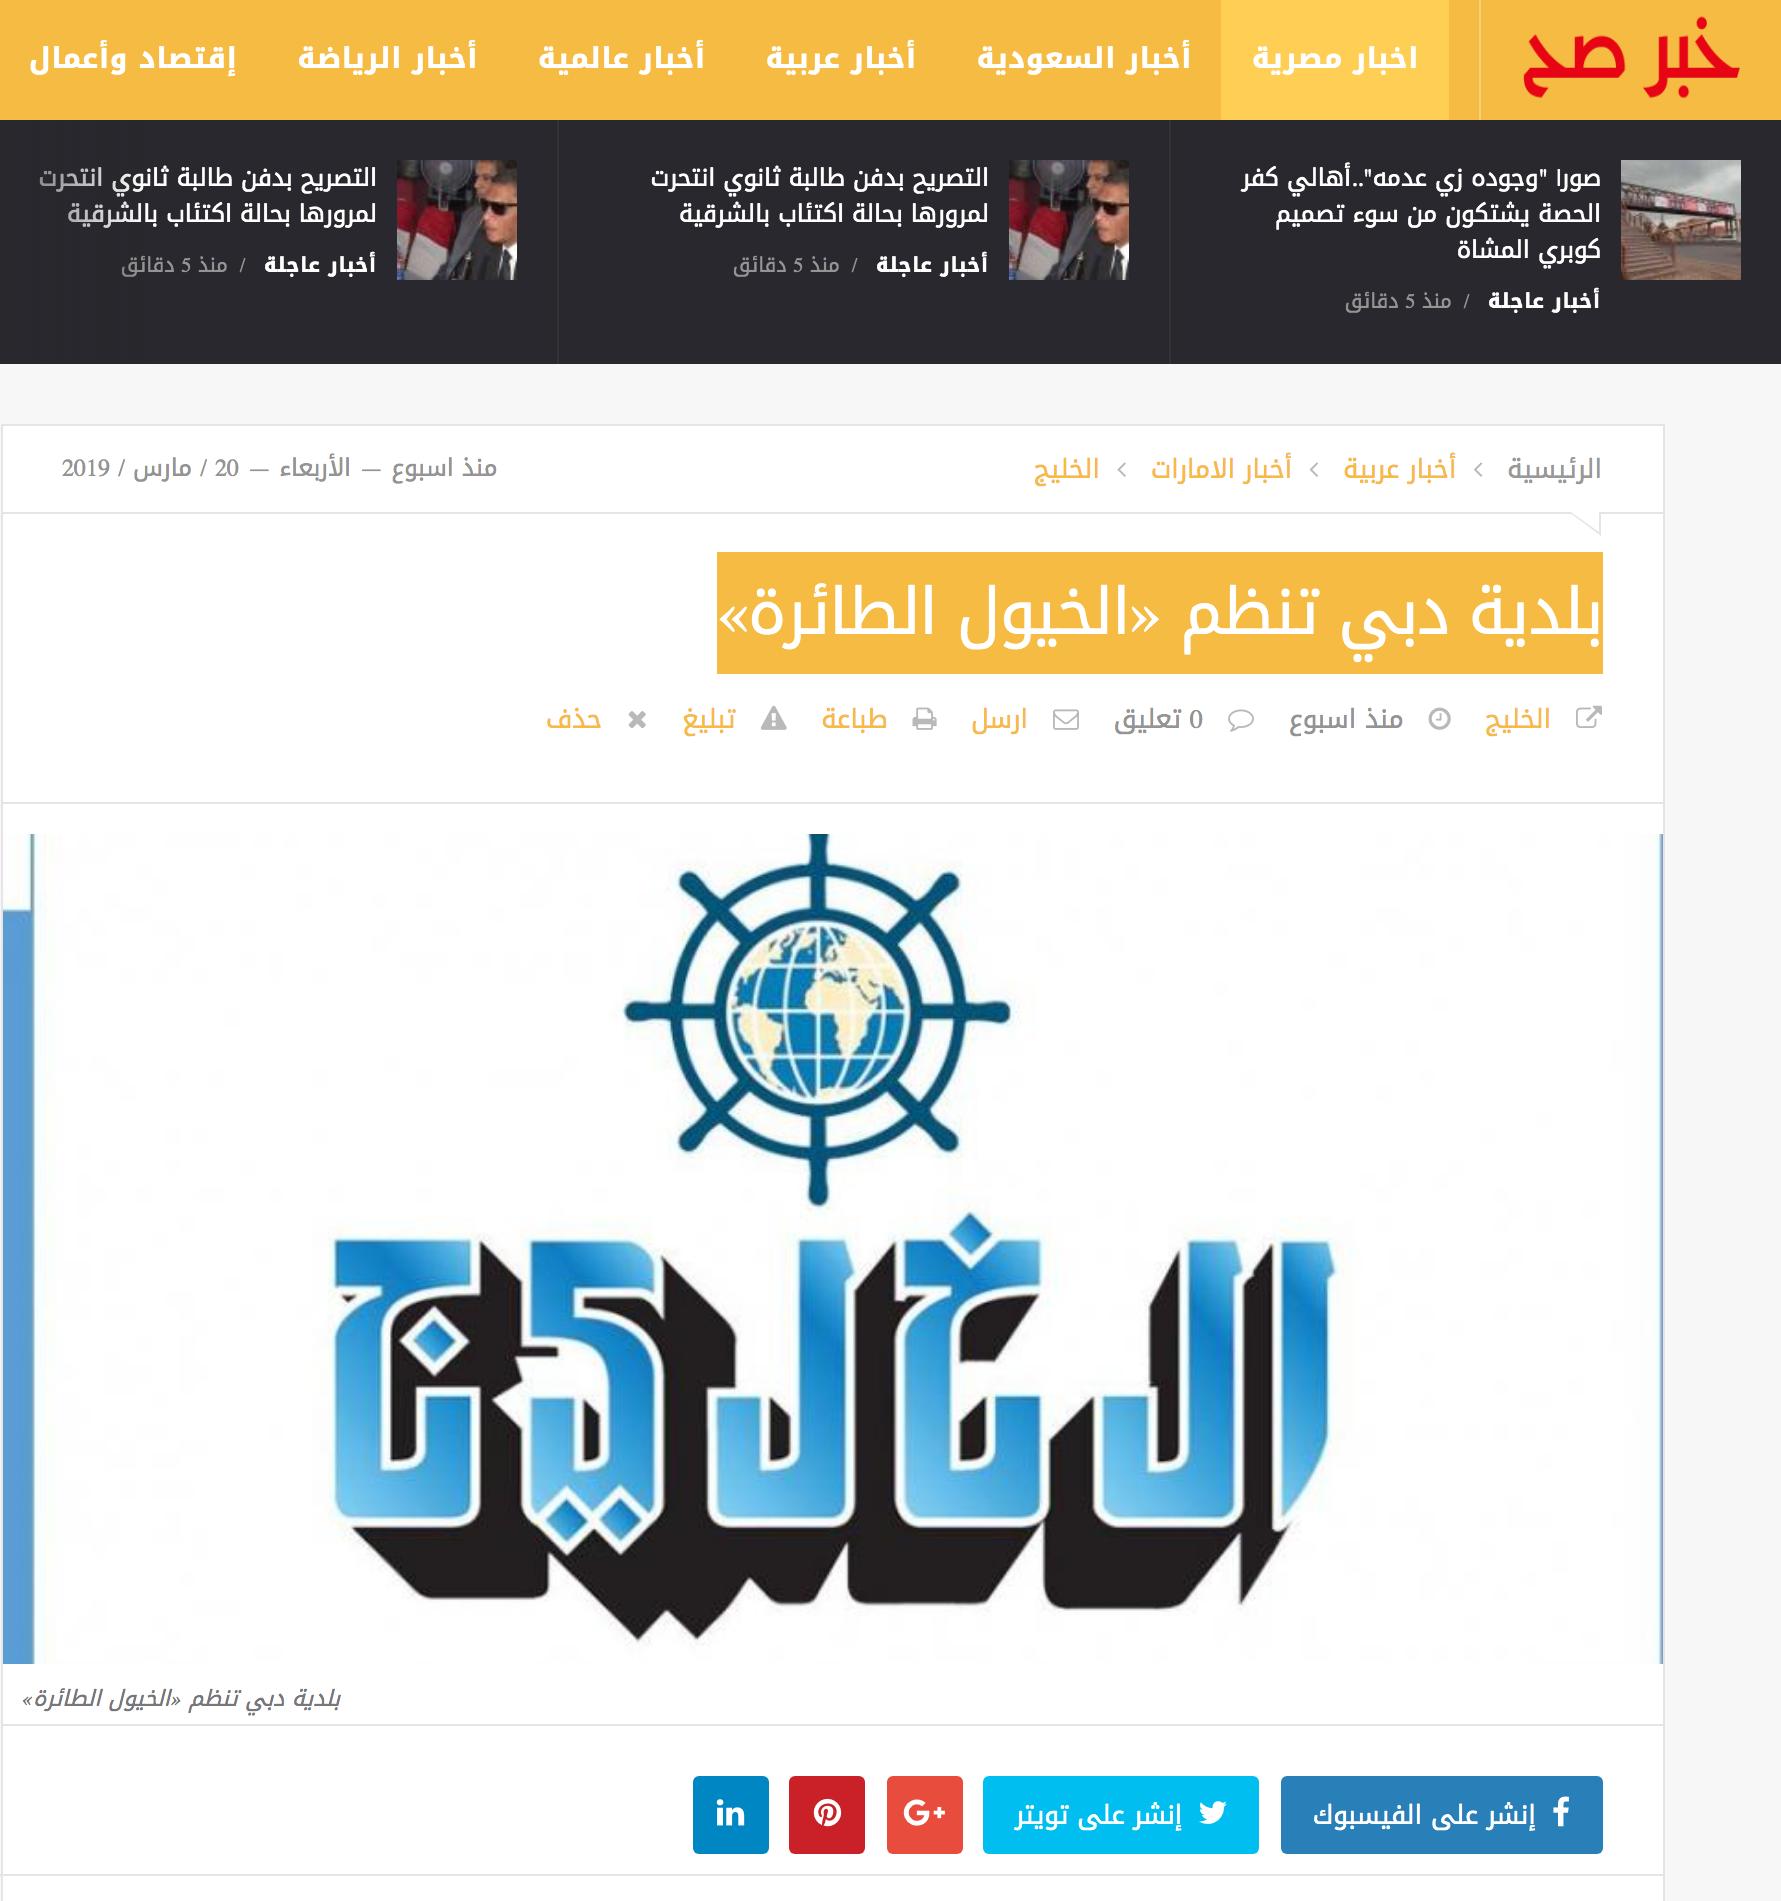 FireShot Capture 006 - بلدية دبي تنظم «الخيول الطائرة» - khabars7.com.png